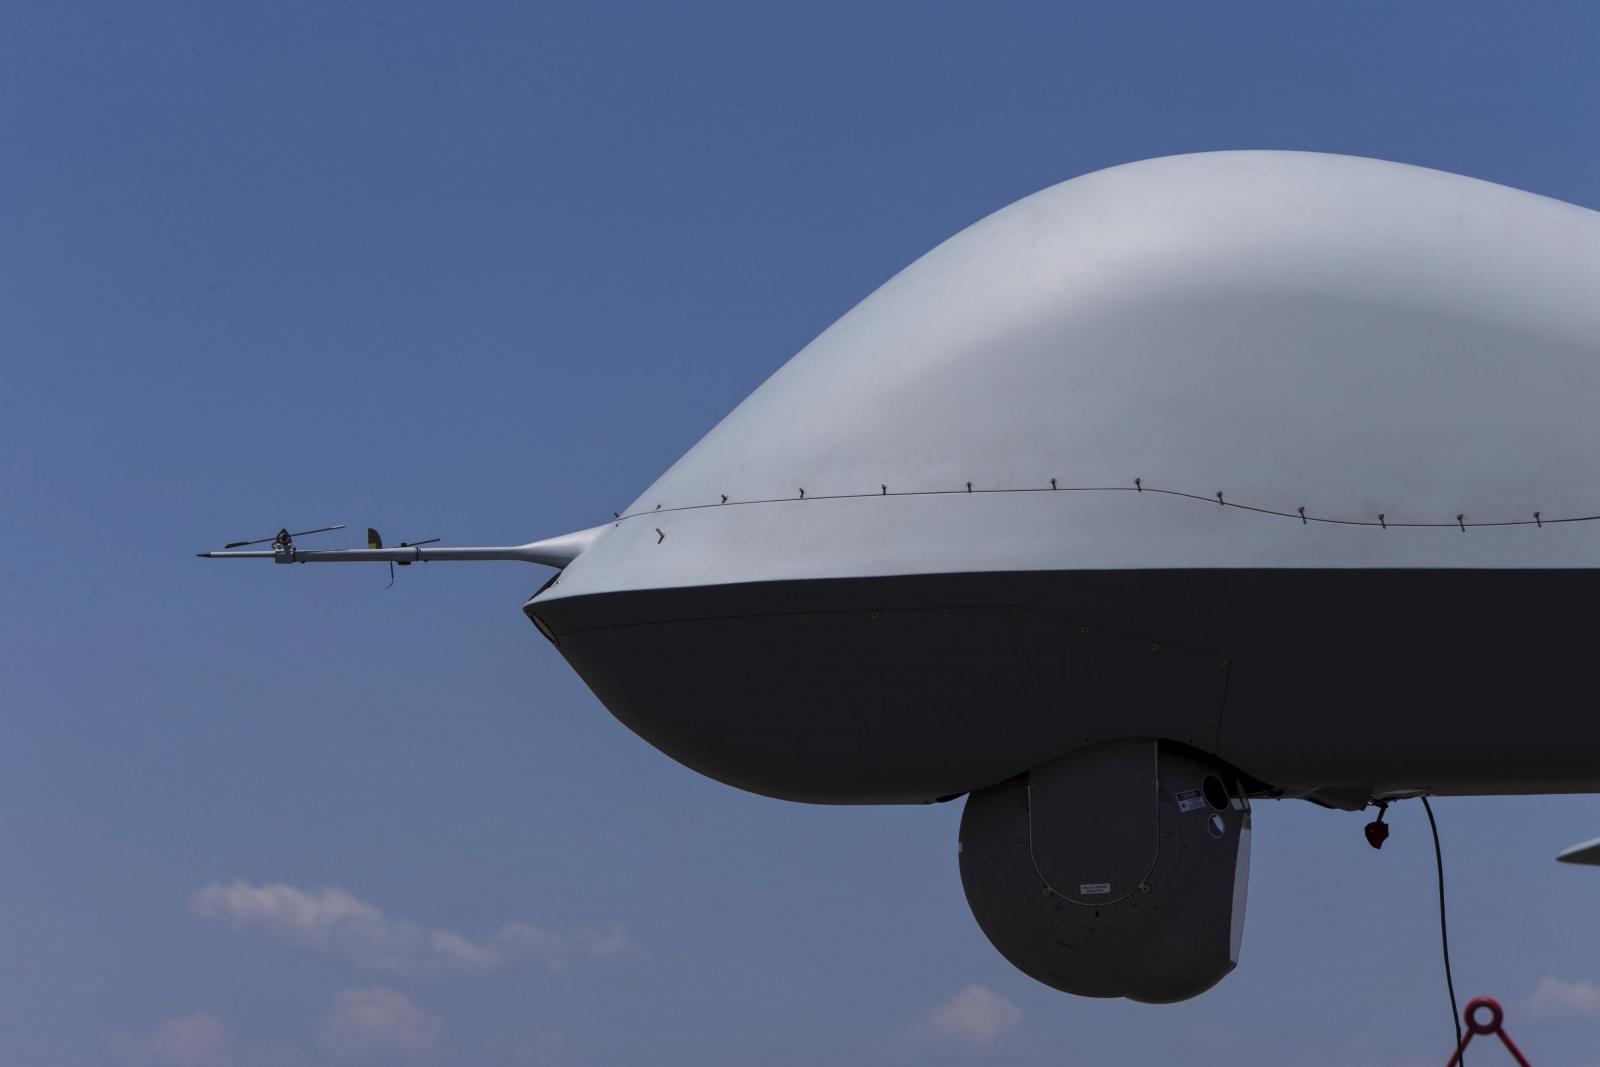 A General Atomics MQ-9 Reaper military drone